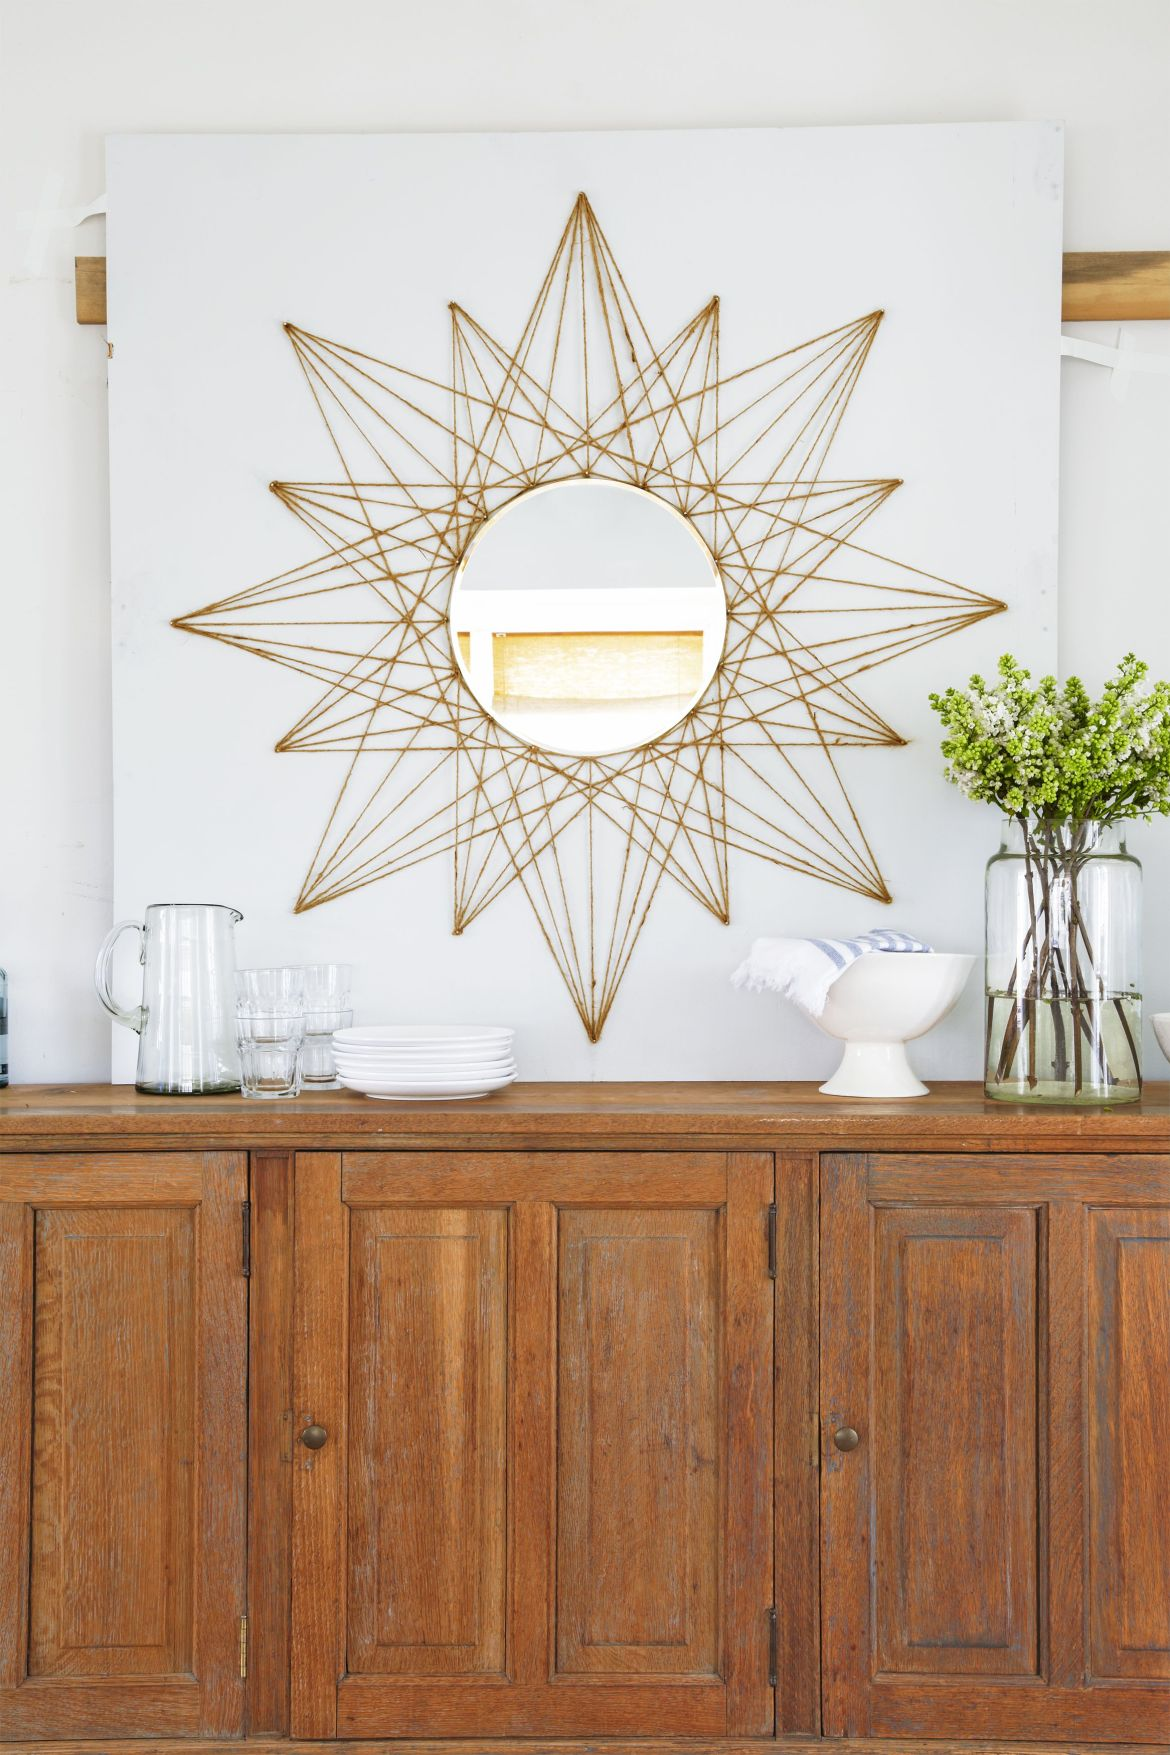 DIY Home Decor Ideas To Try During Quarantine